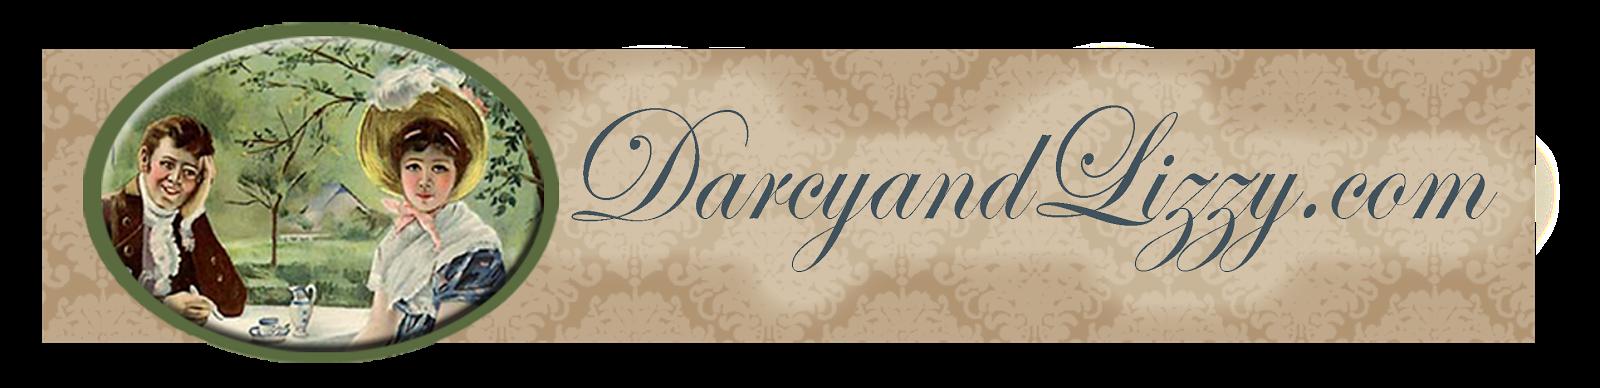 DarcyandLizzy.Com